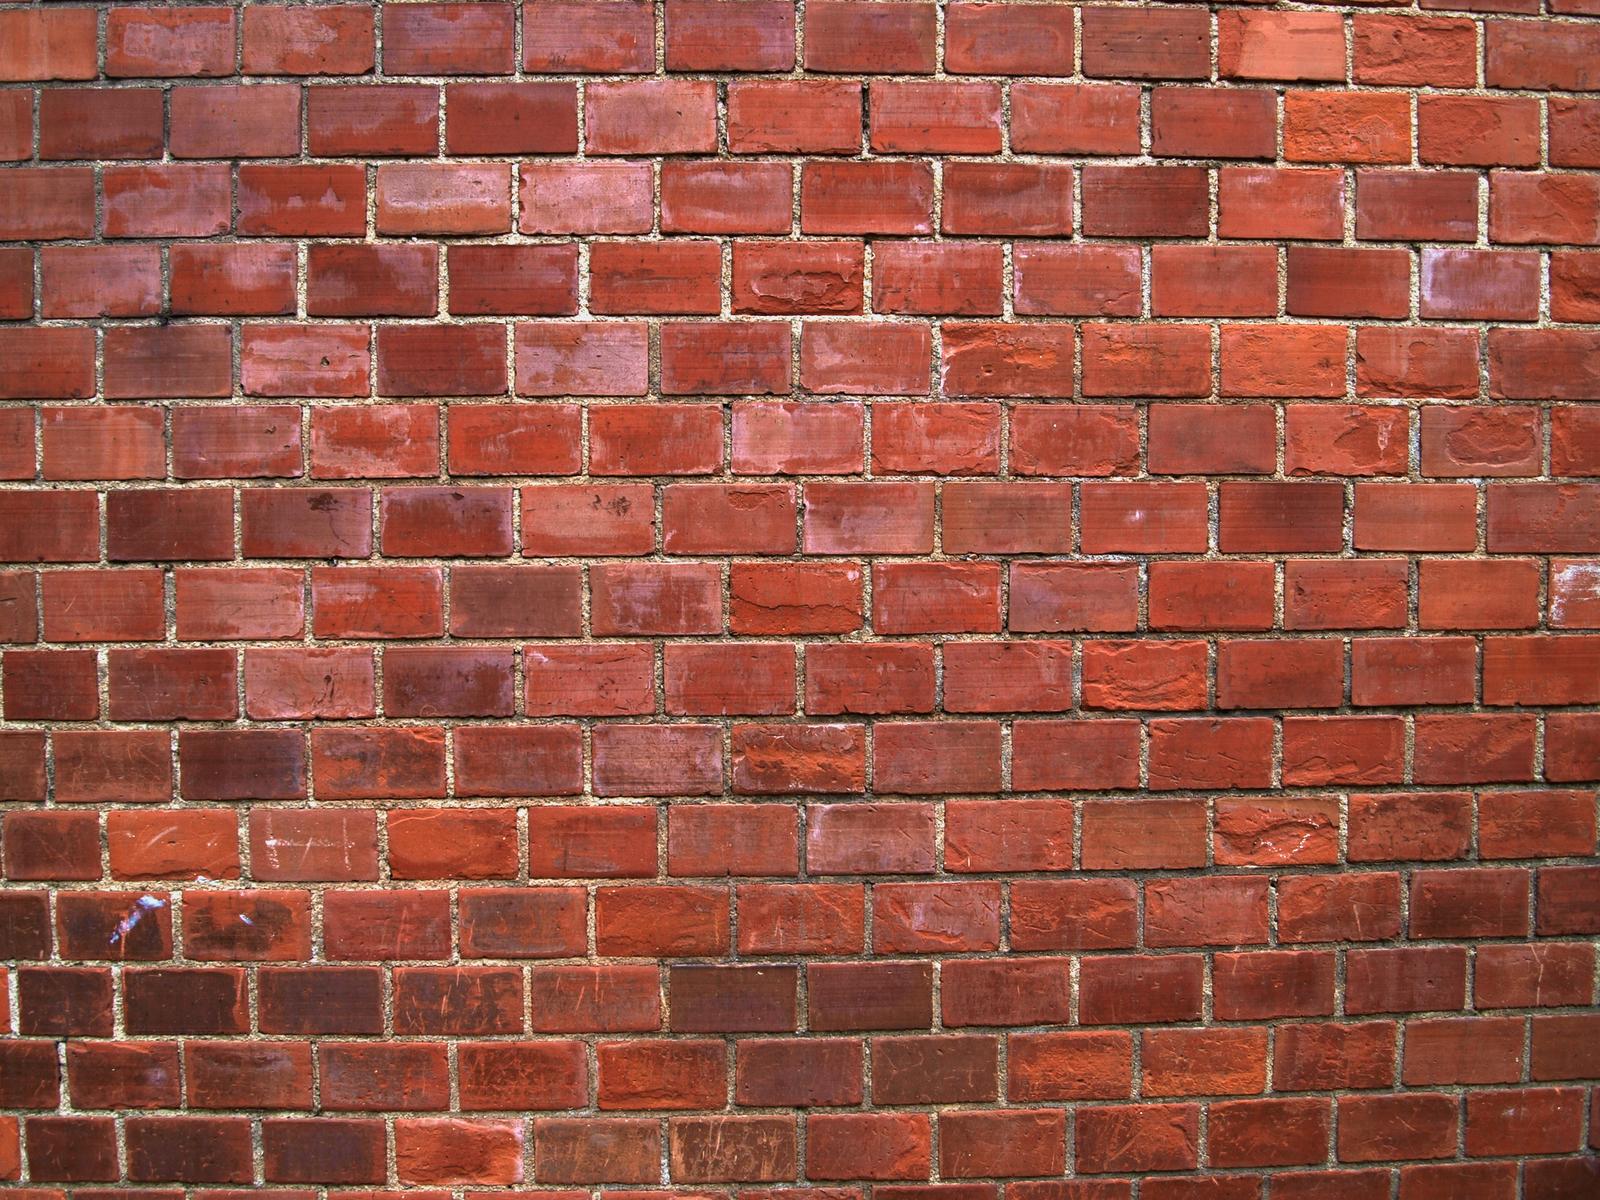 Old Brick Wall Decor : Variations of old red brick wall reusage